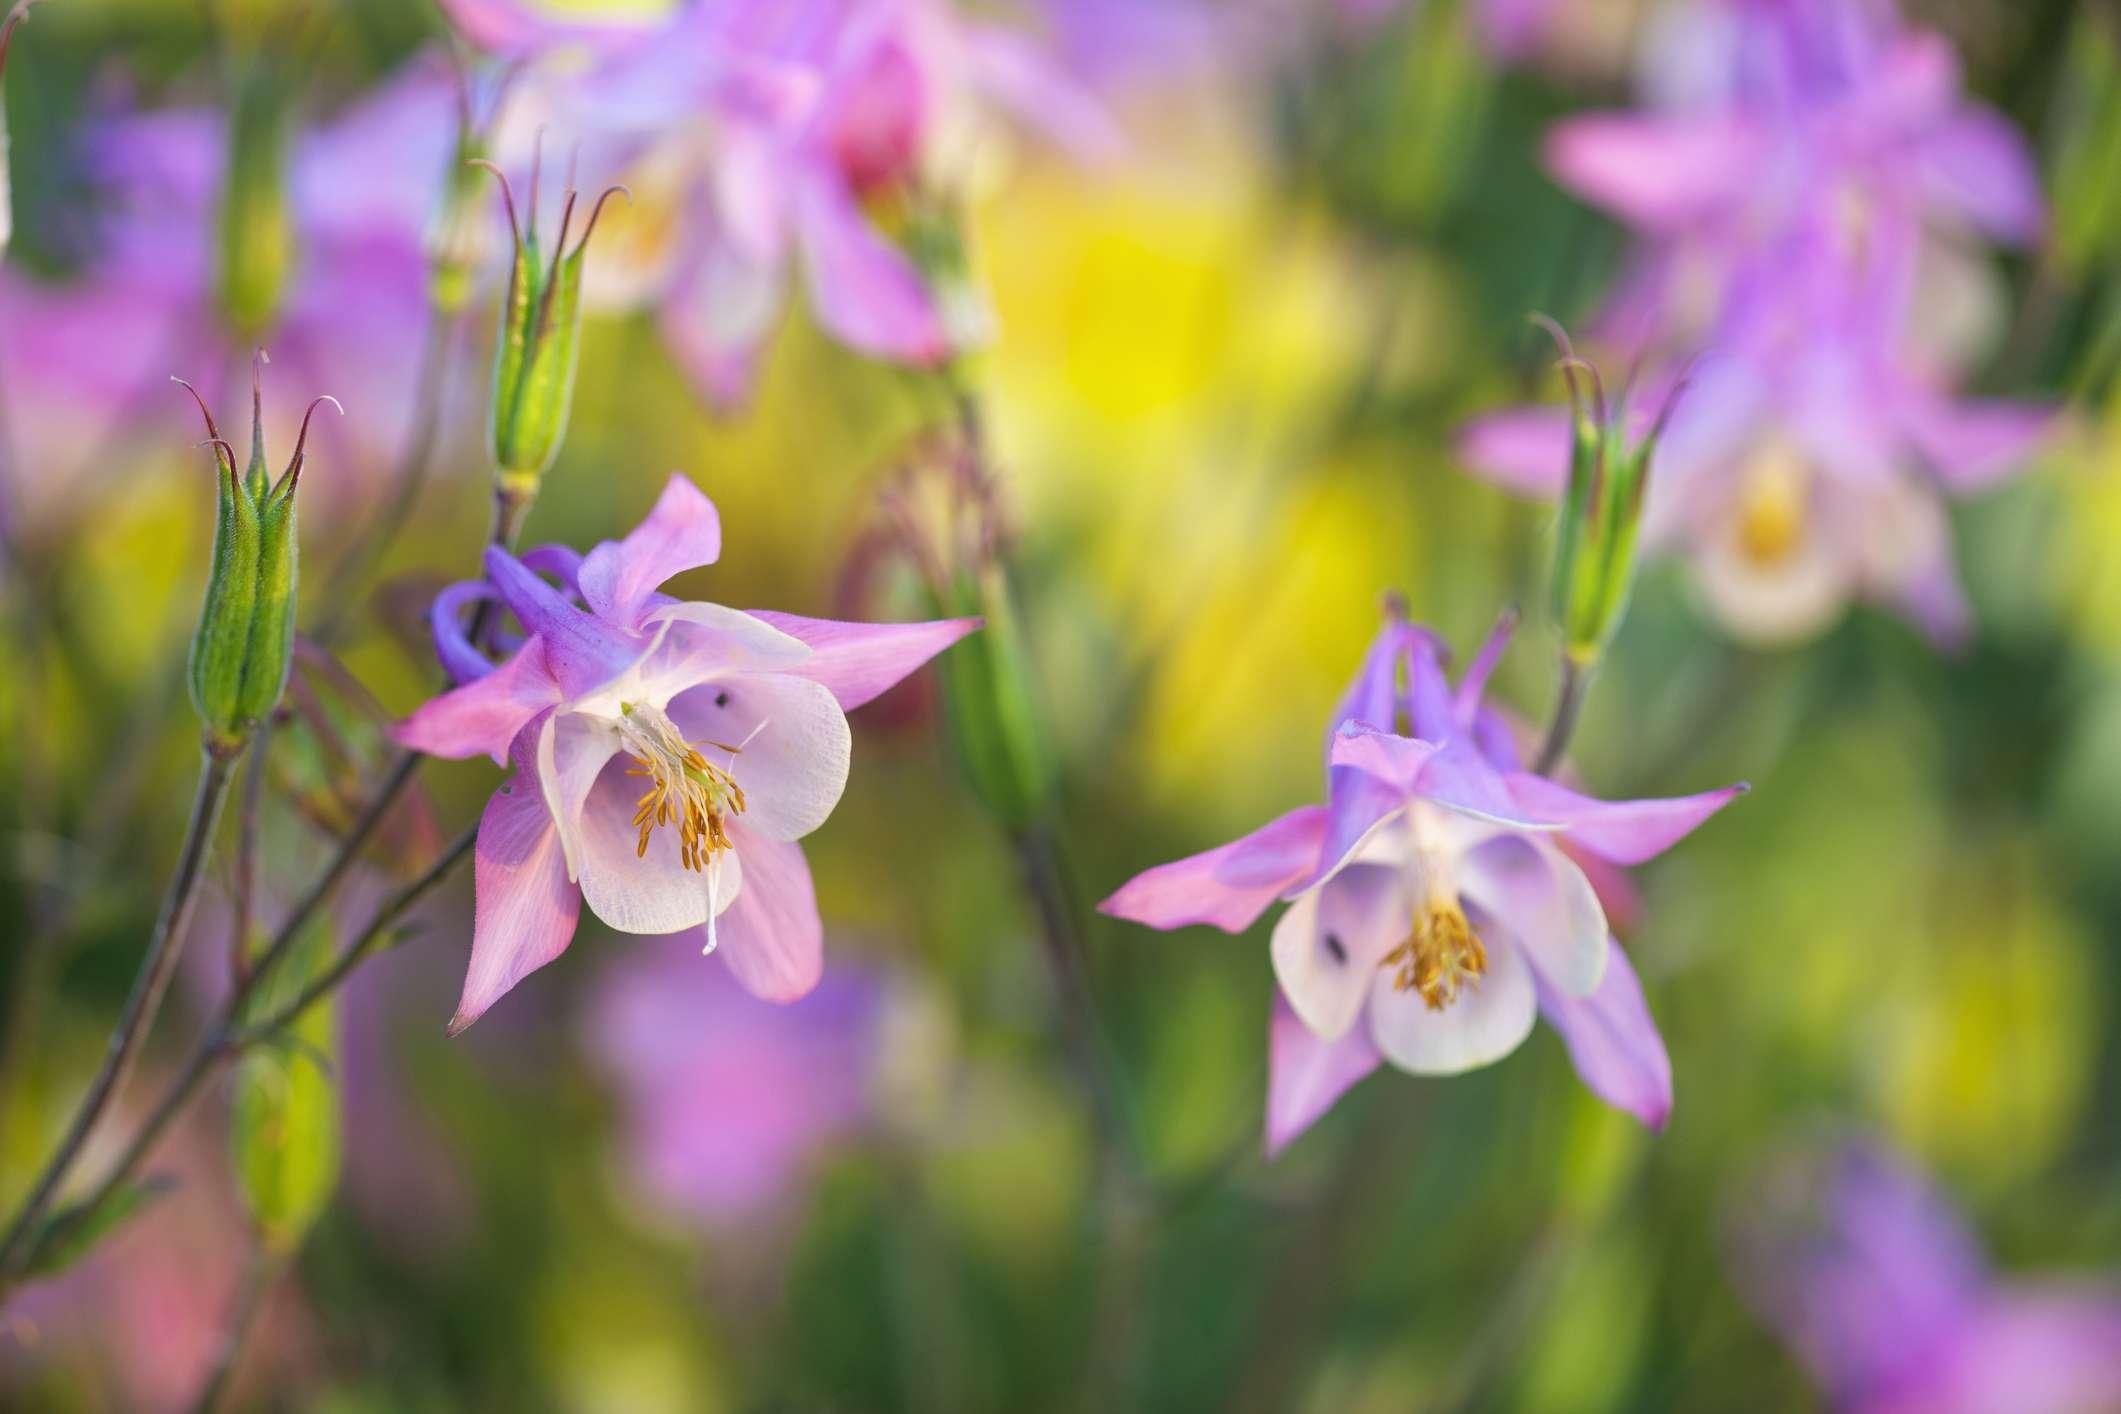 Pink columbine flowers